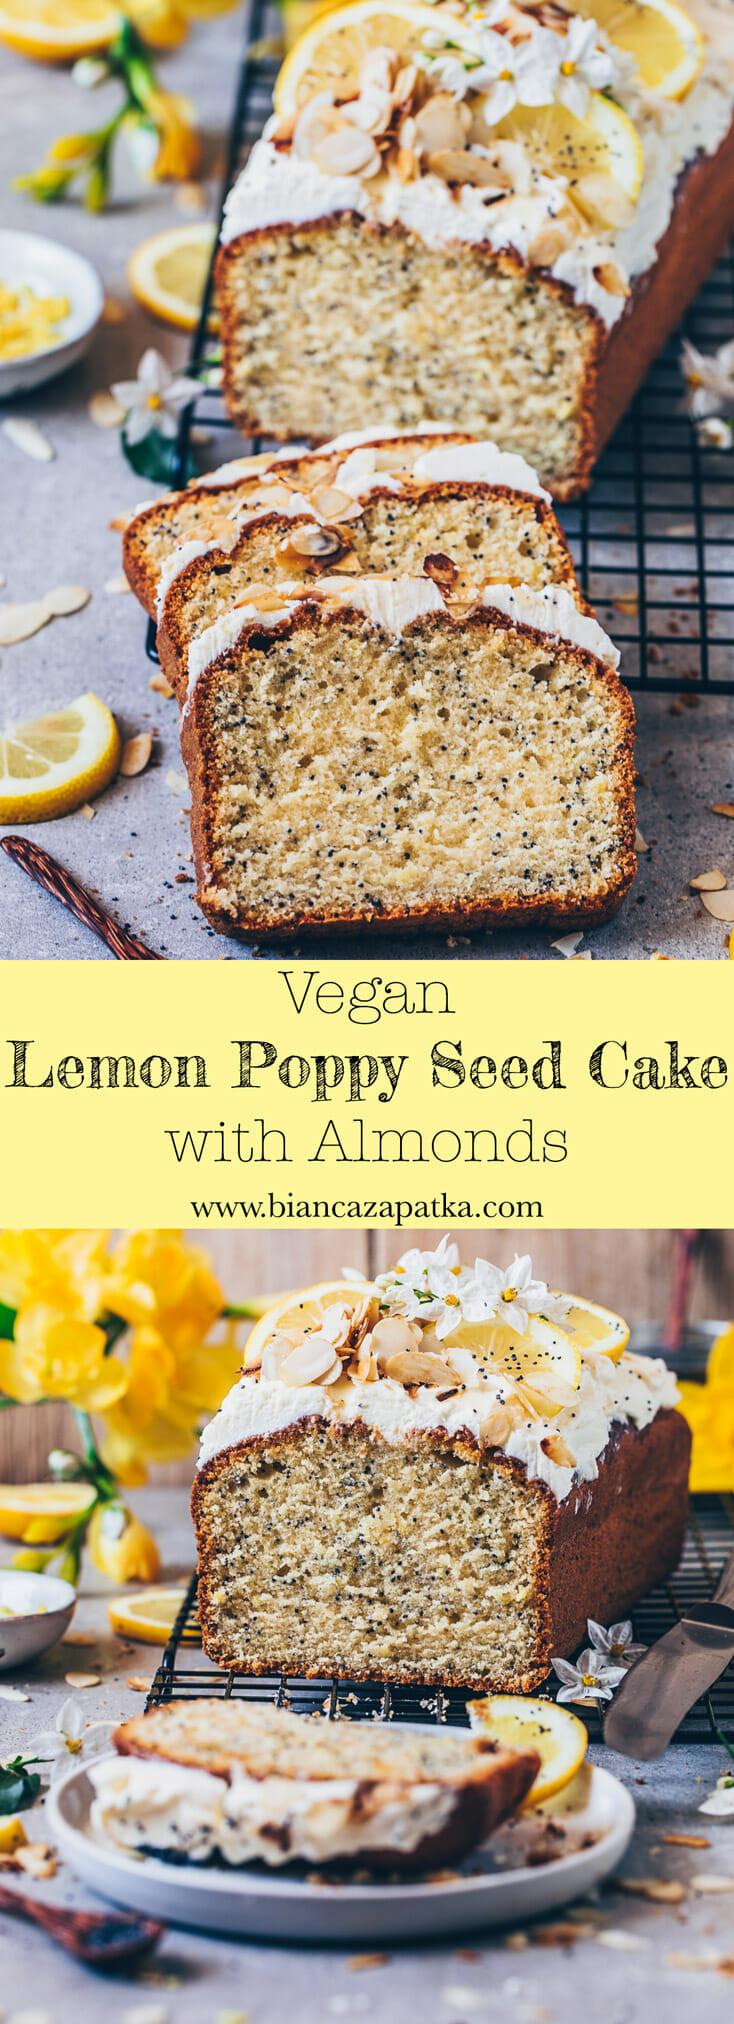 Vegetarian Lemon Cake Recipe  Lemon Poppy Seed Cake Vegan Bianca Zapatka